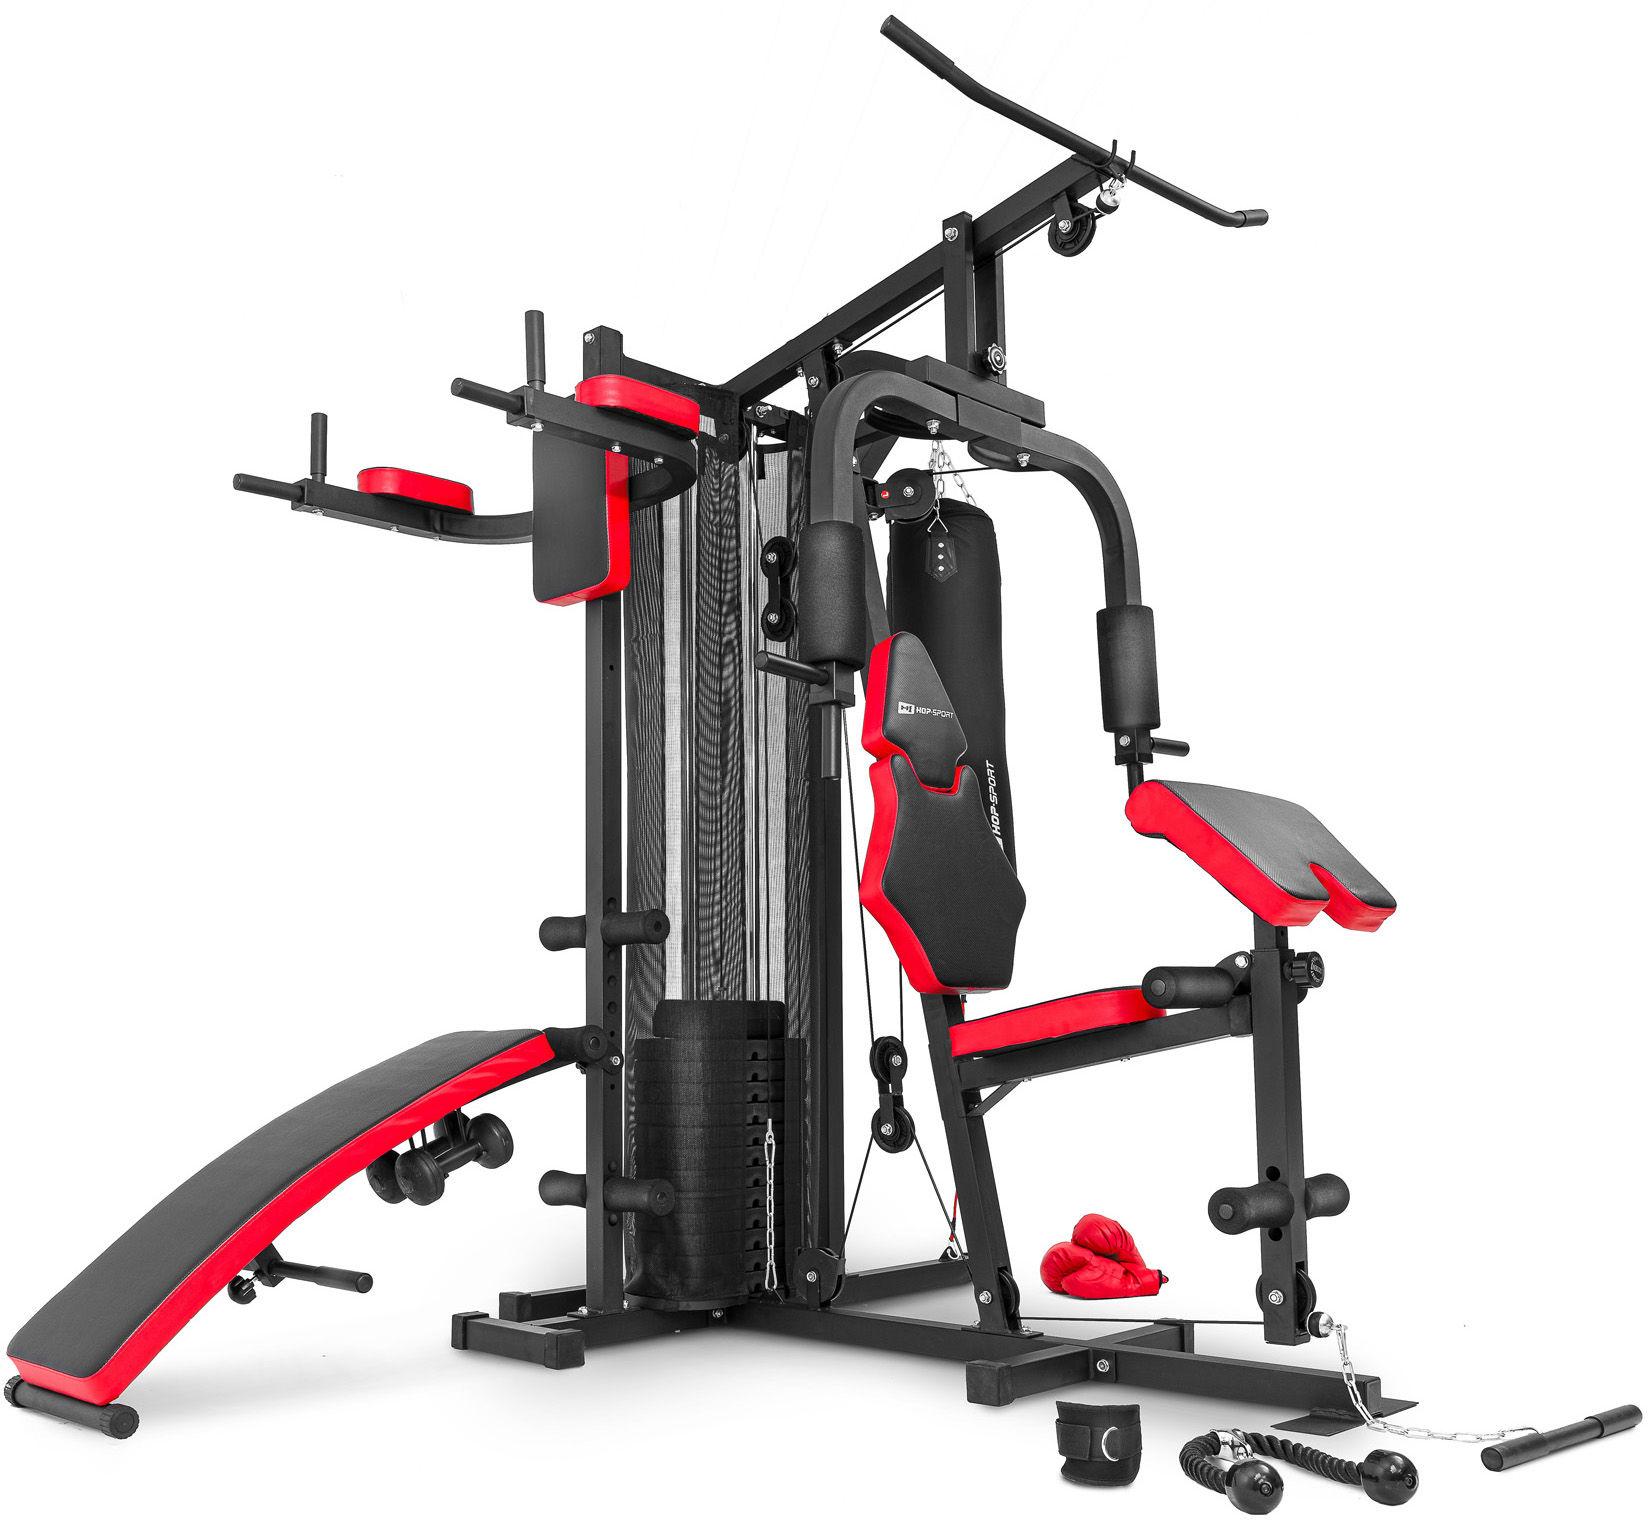 Atlas do ćwiczeń